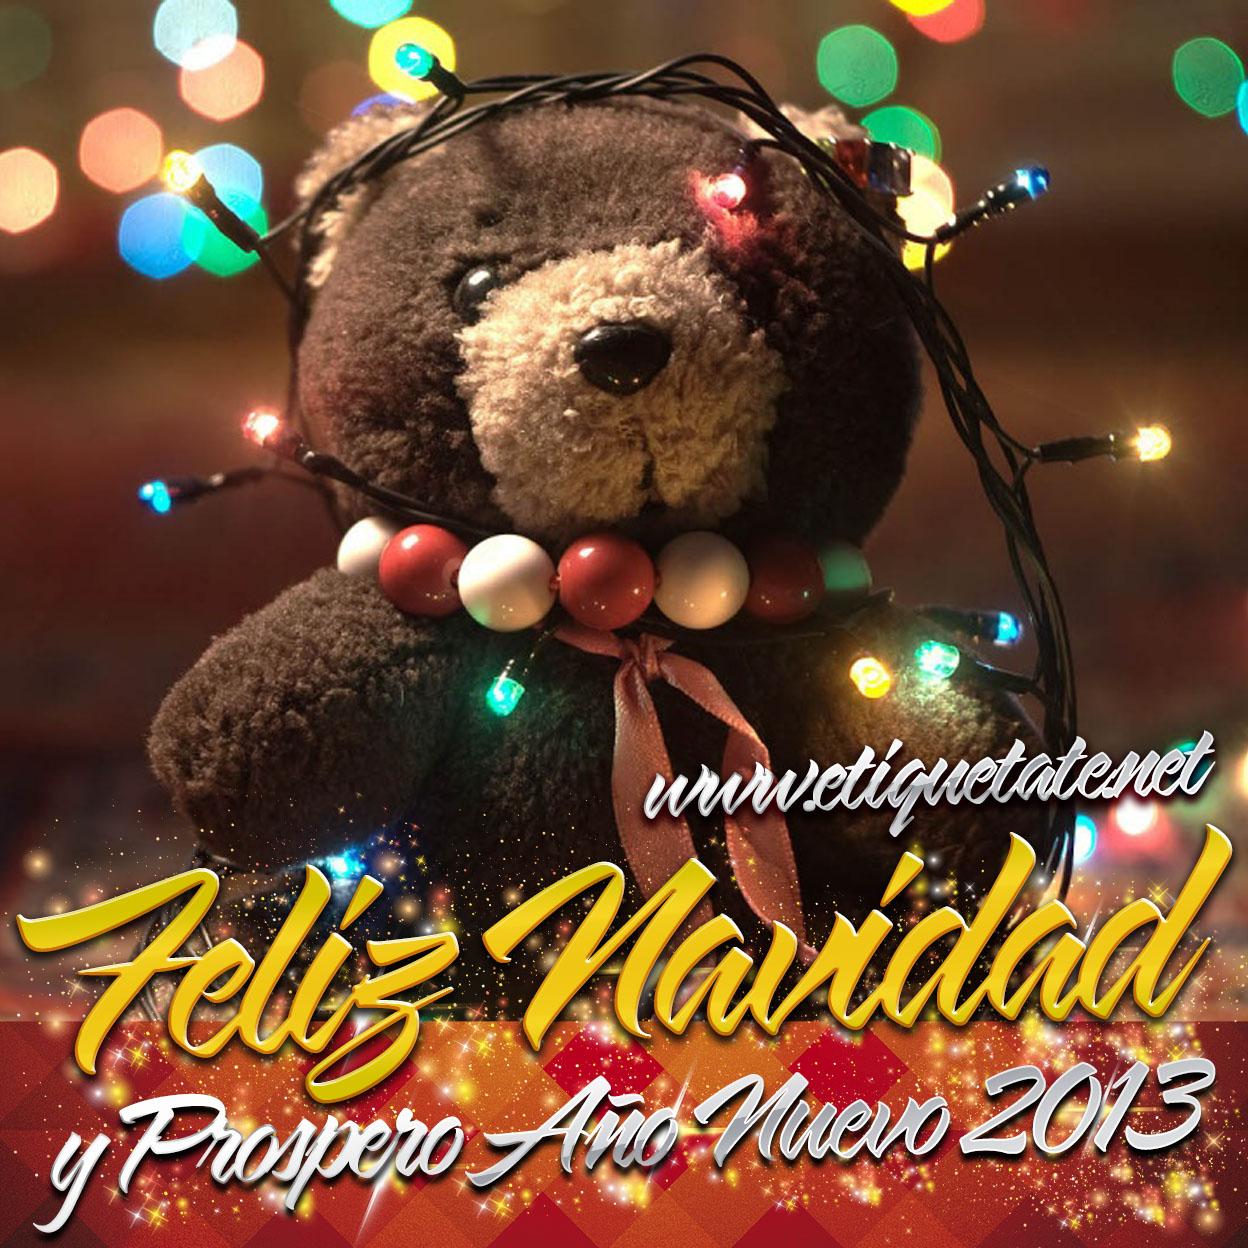 Ositos navide os 2013 para descargar gratis - Imagenes de corazones navidenos ...